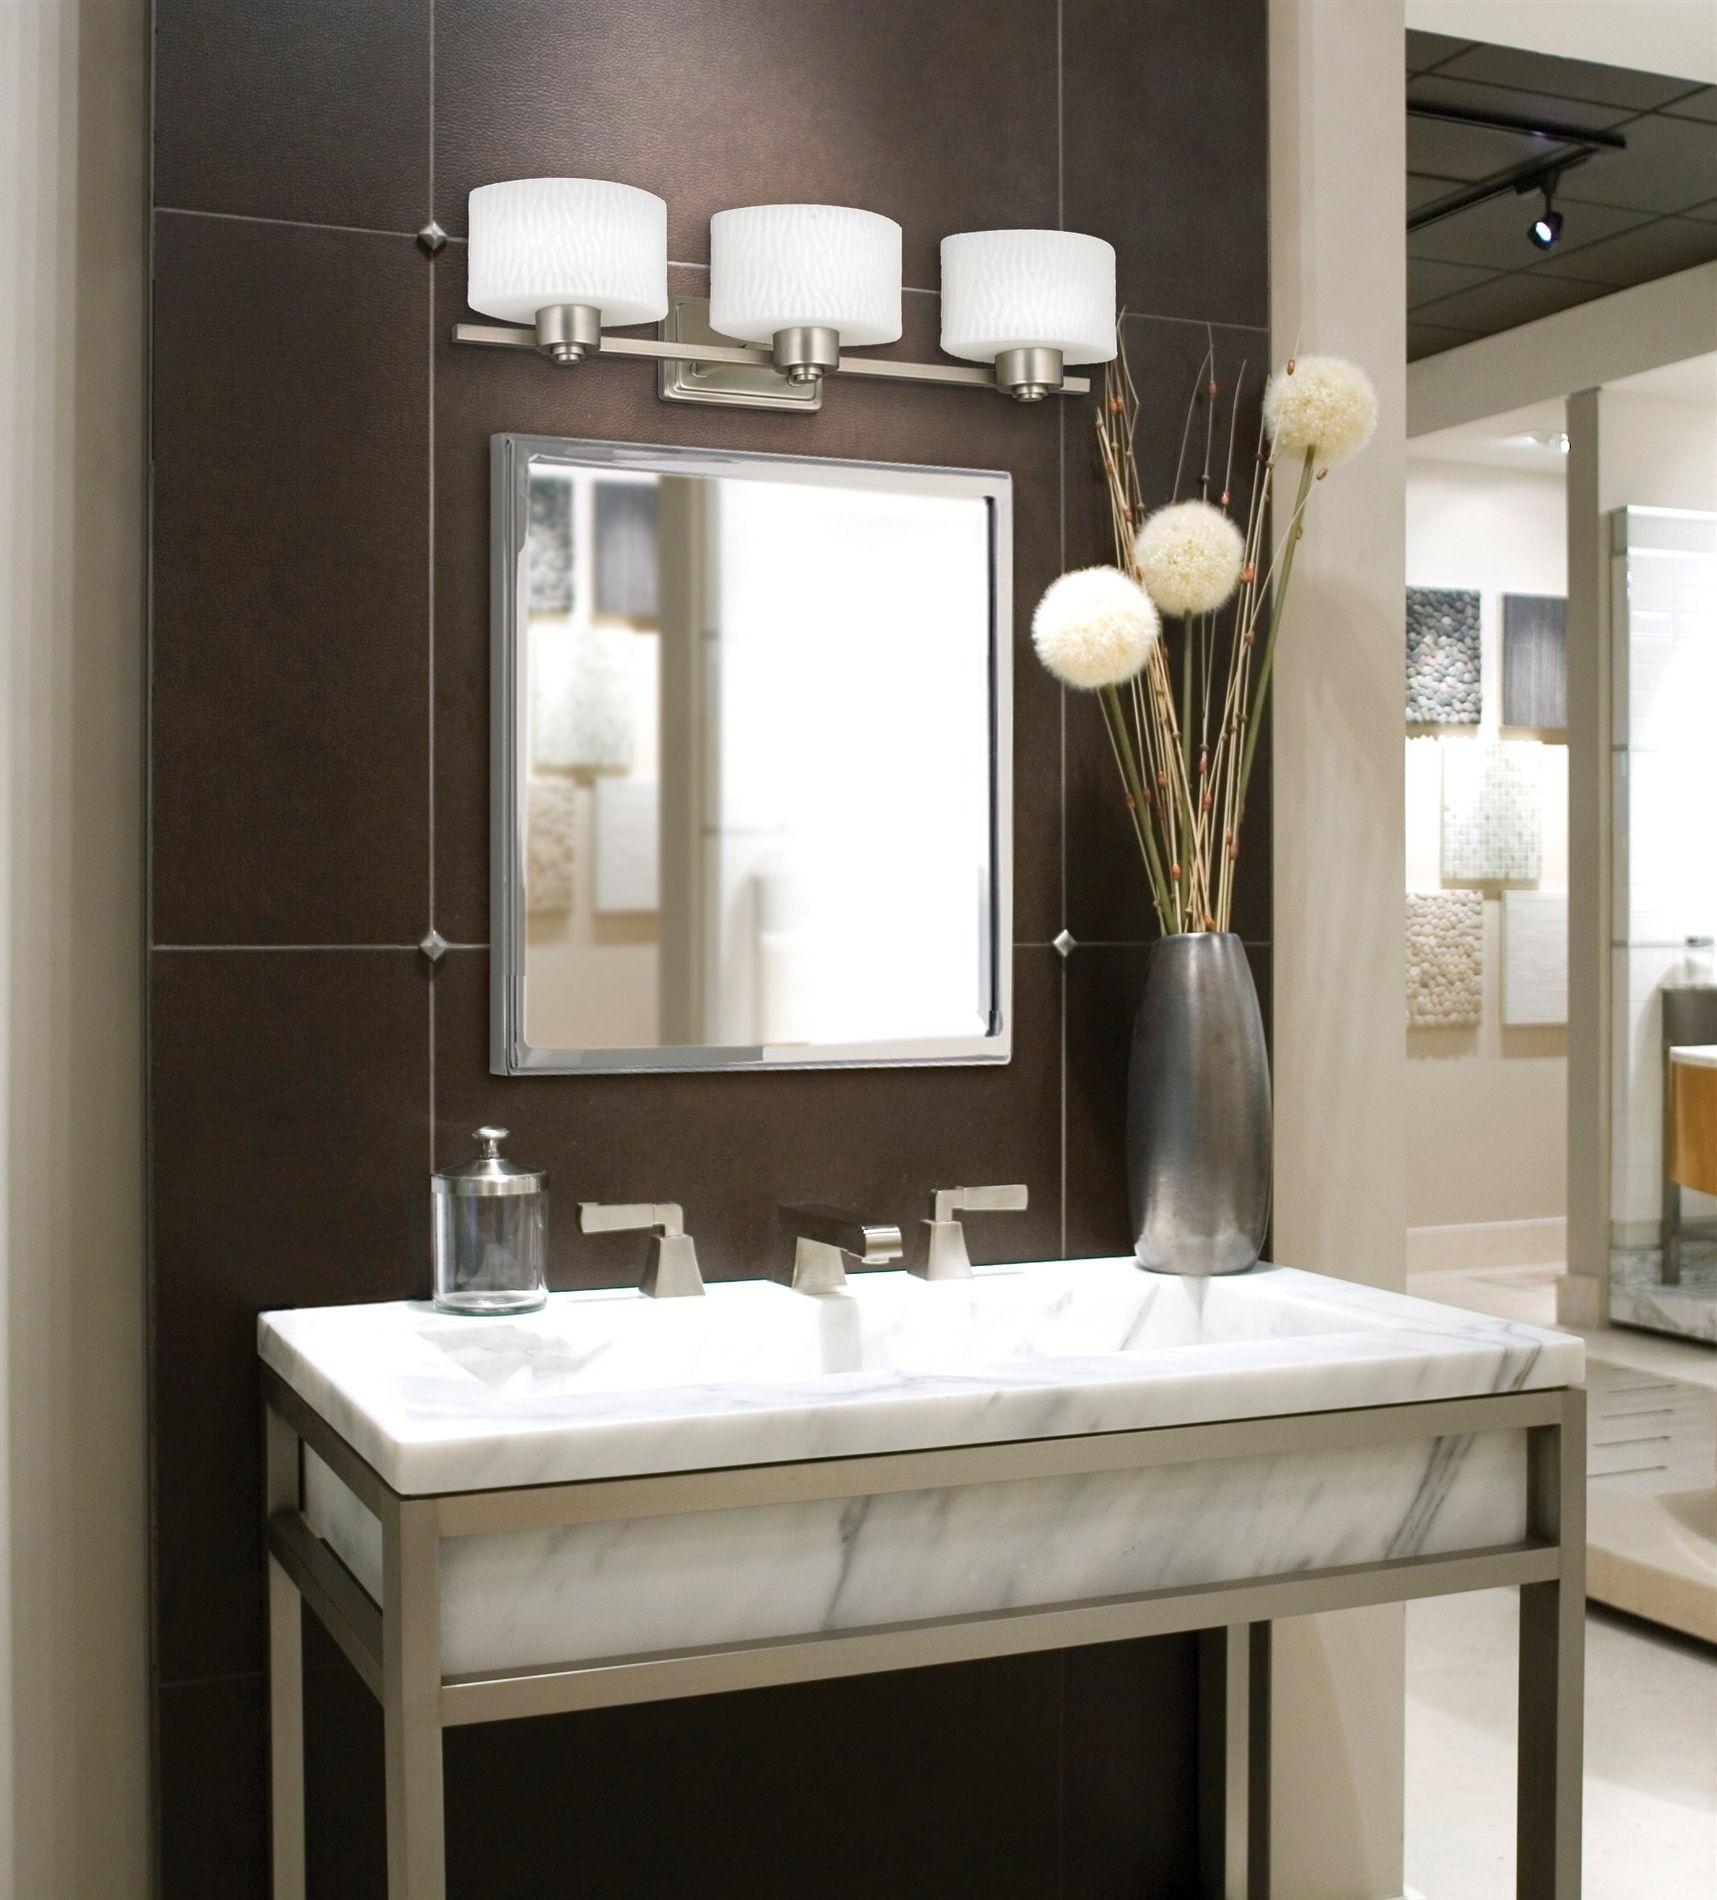 Picture Light Over Bathroom Mirror